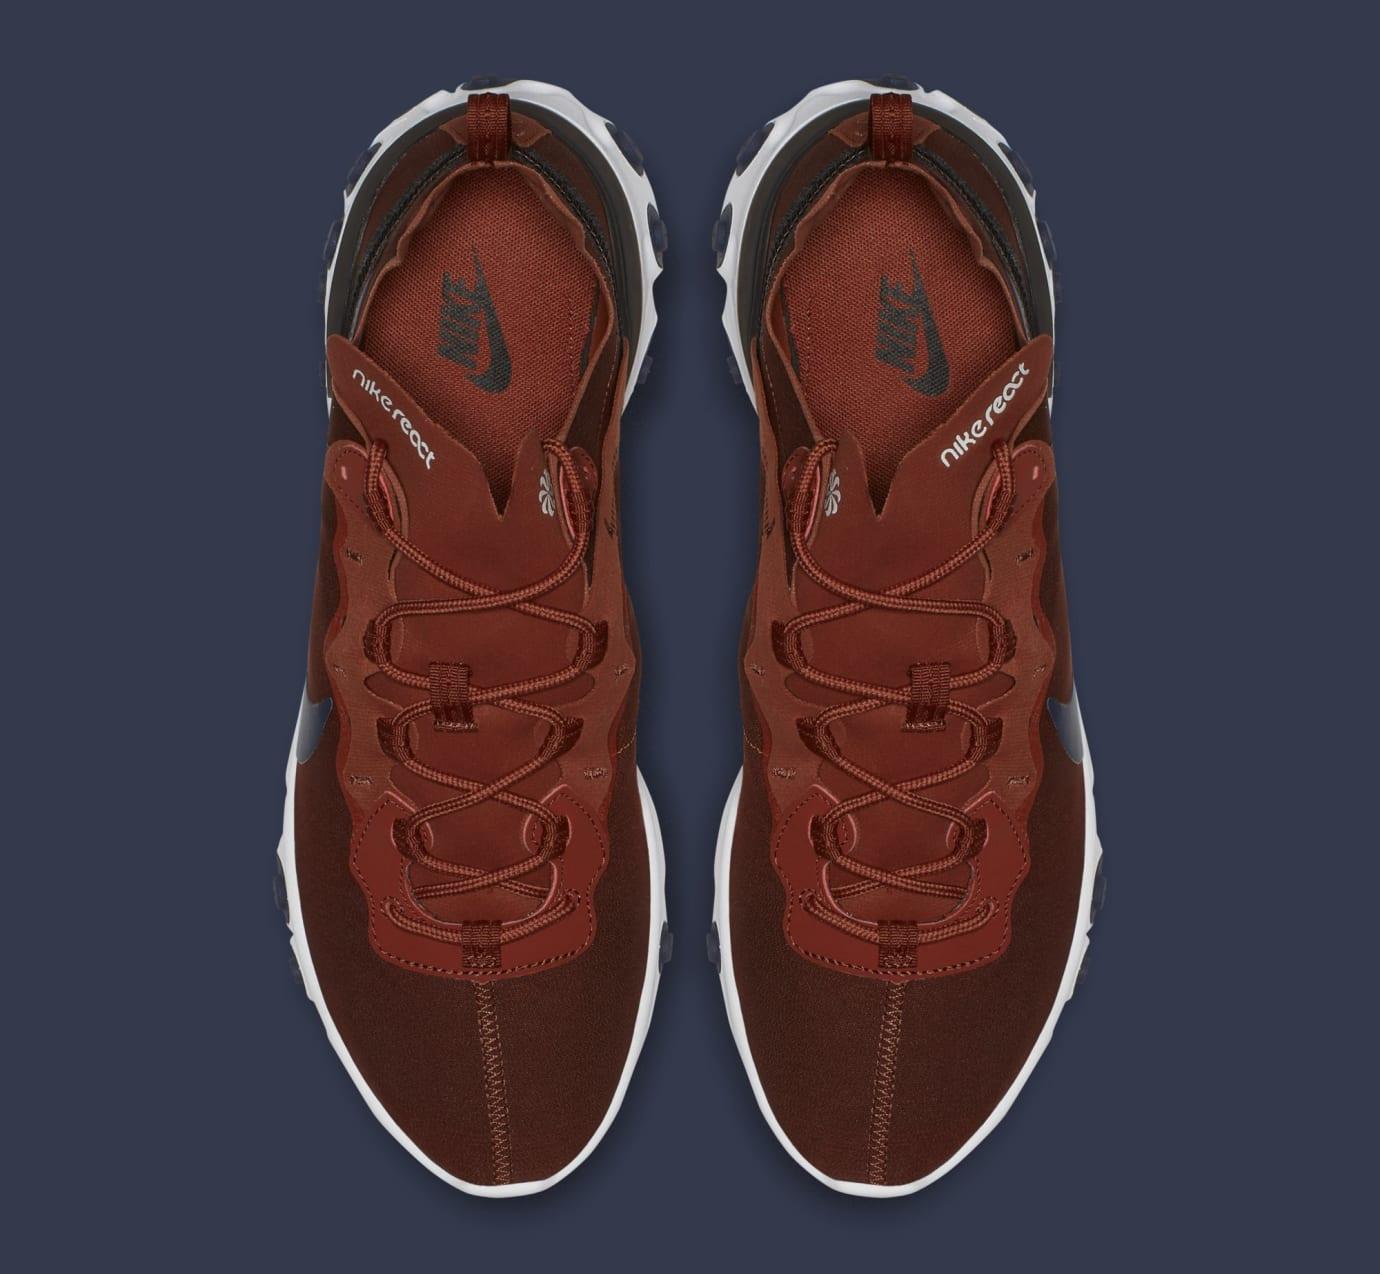 Nike React Element 55 'Brown' BQ6166-600 (Top)